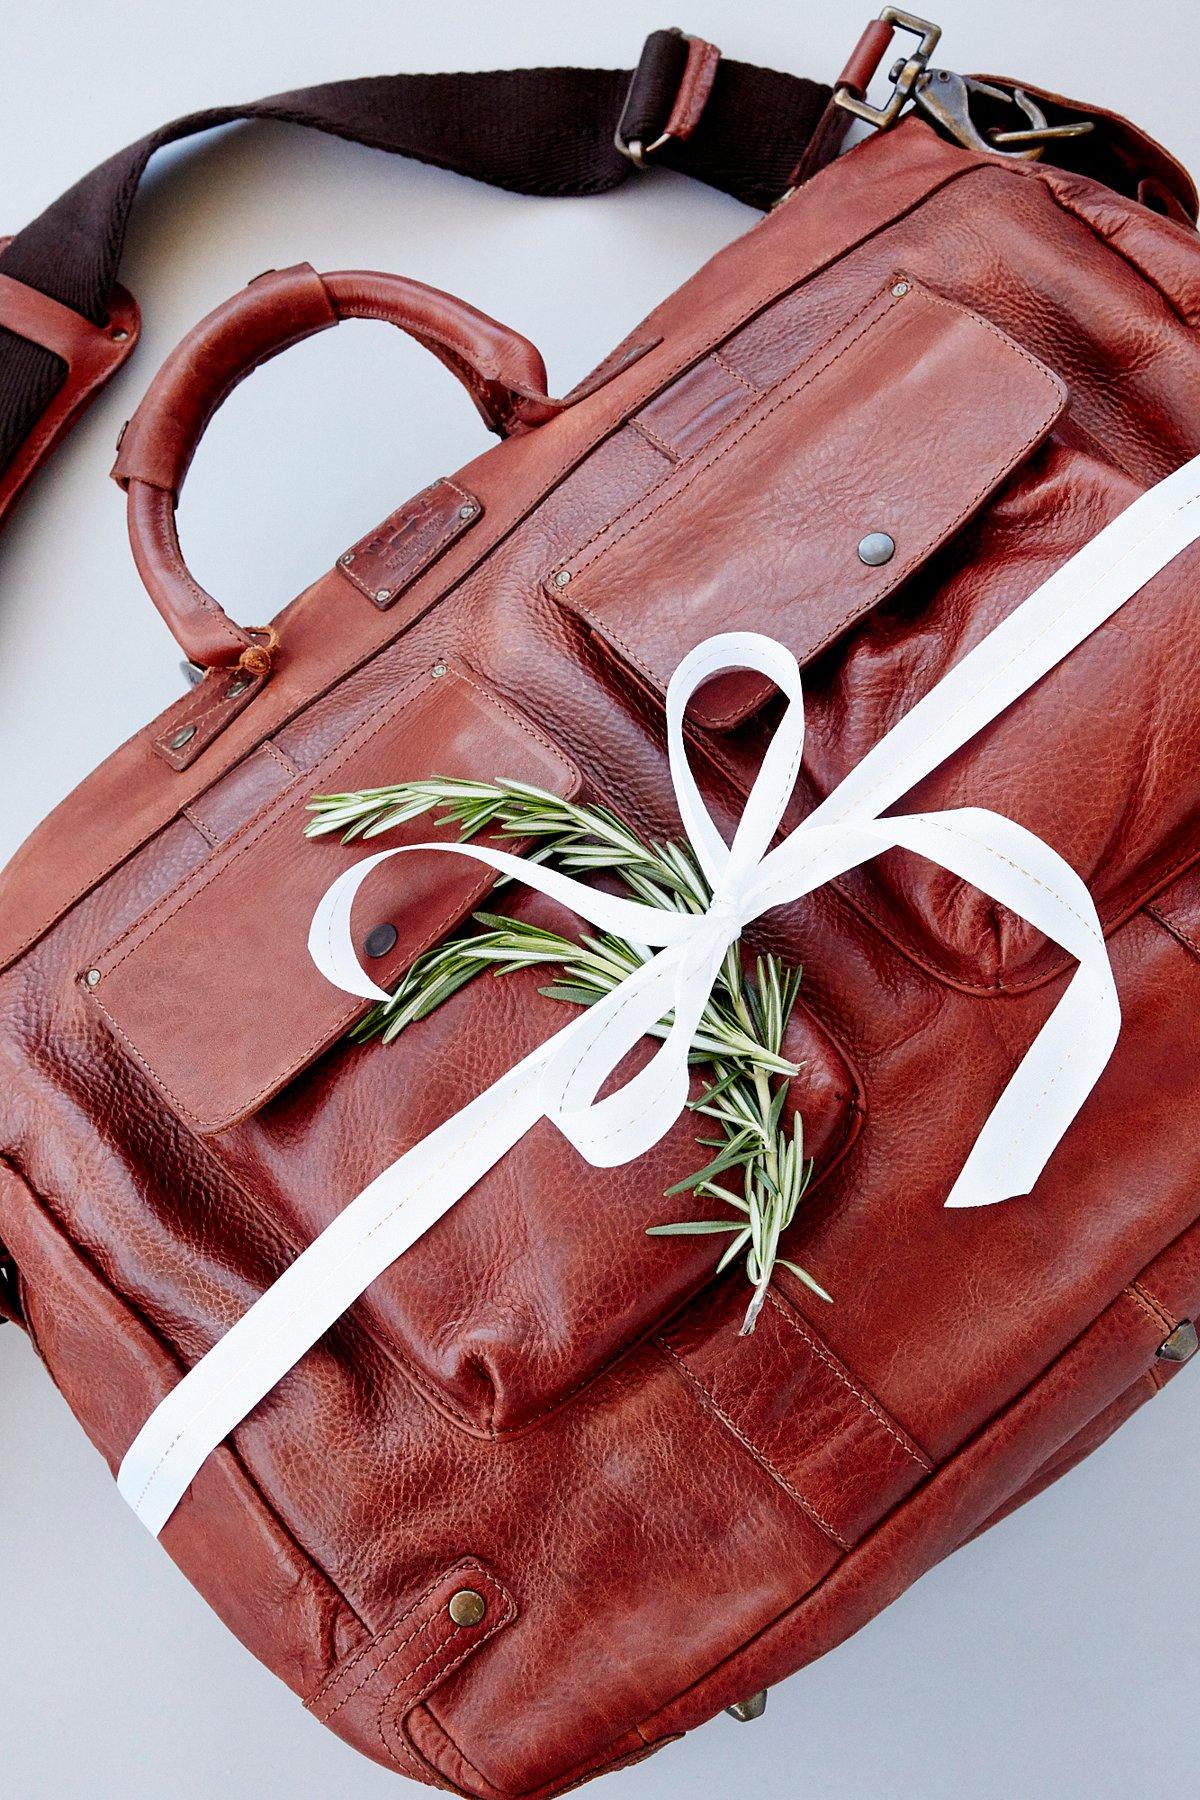 Leather Traveler Duffel Bag x Pillow Set